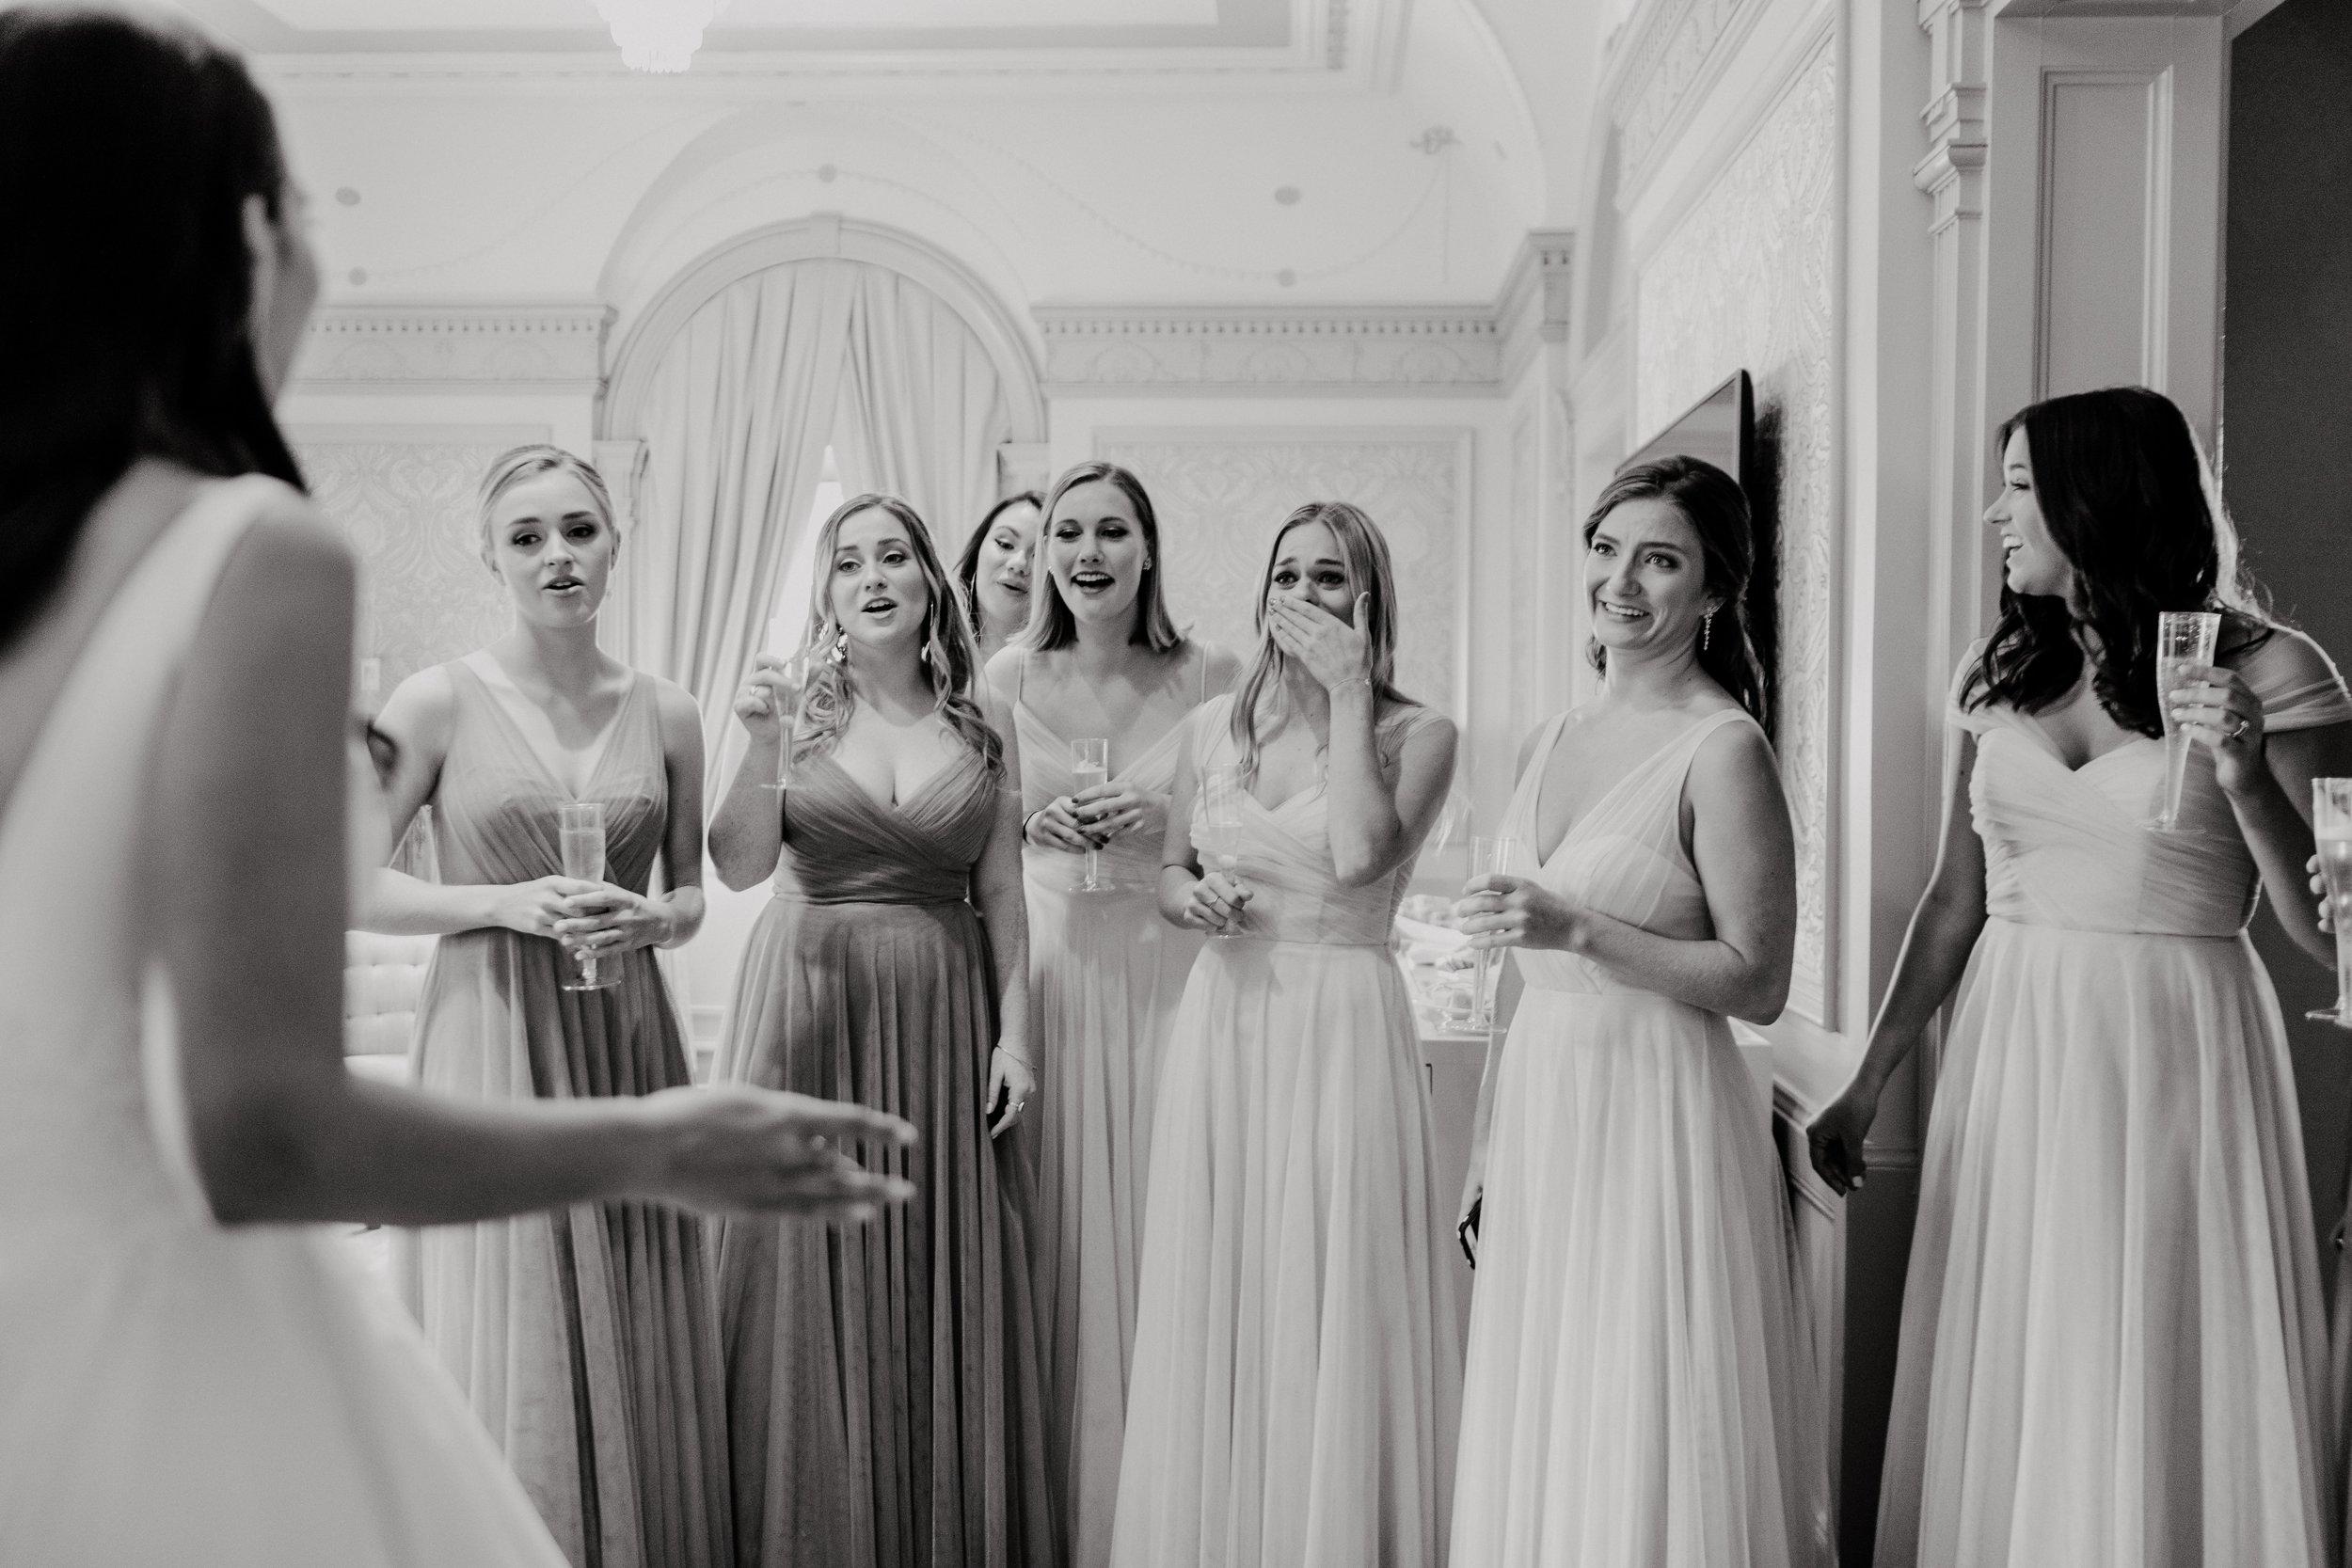 st-anthony-hotel-wedding-photography-10036san-antonio.JPG